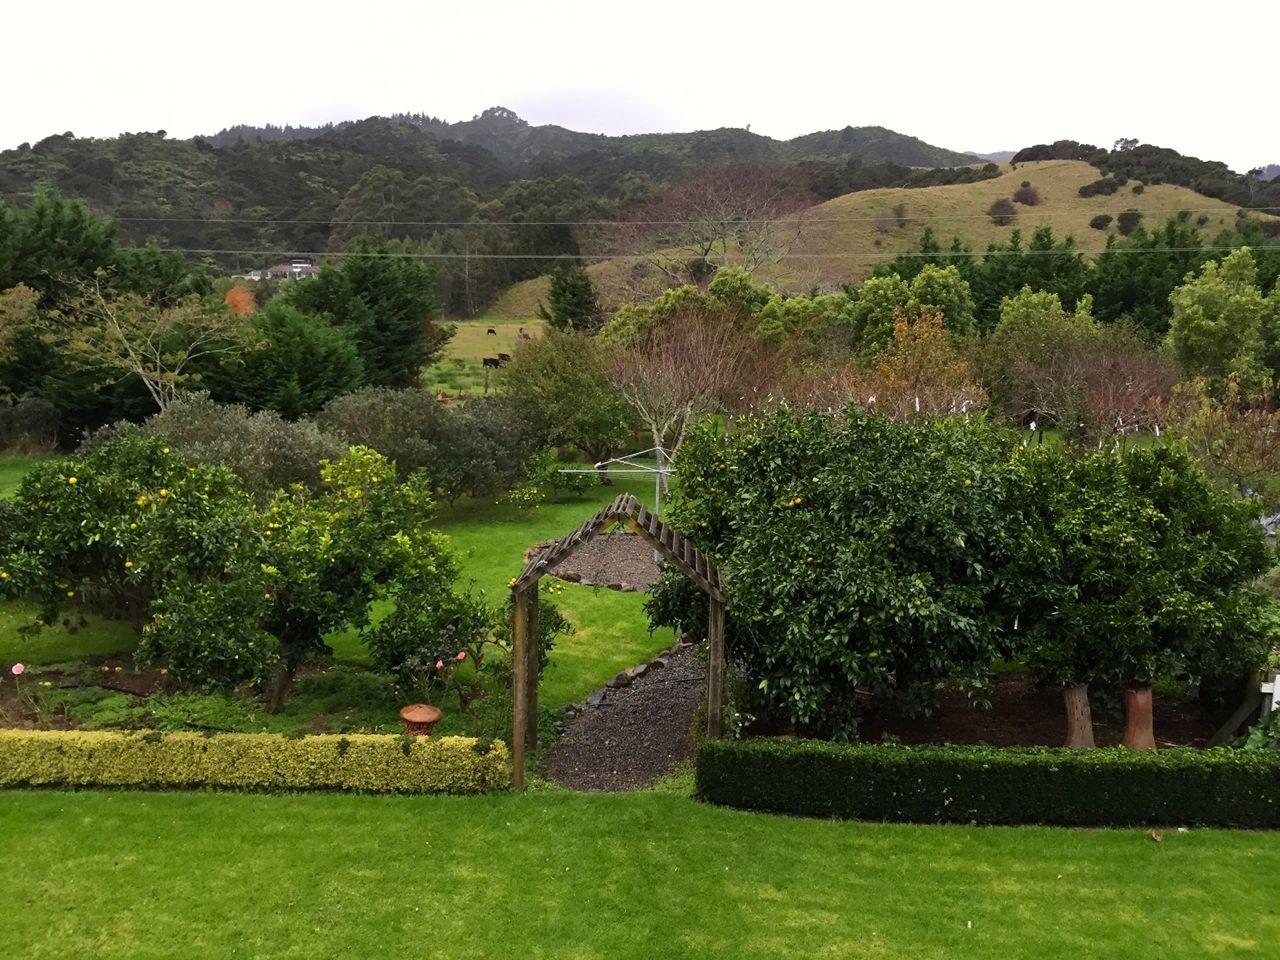 The garden at Jacaranda Lodge